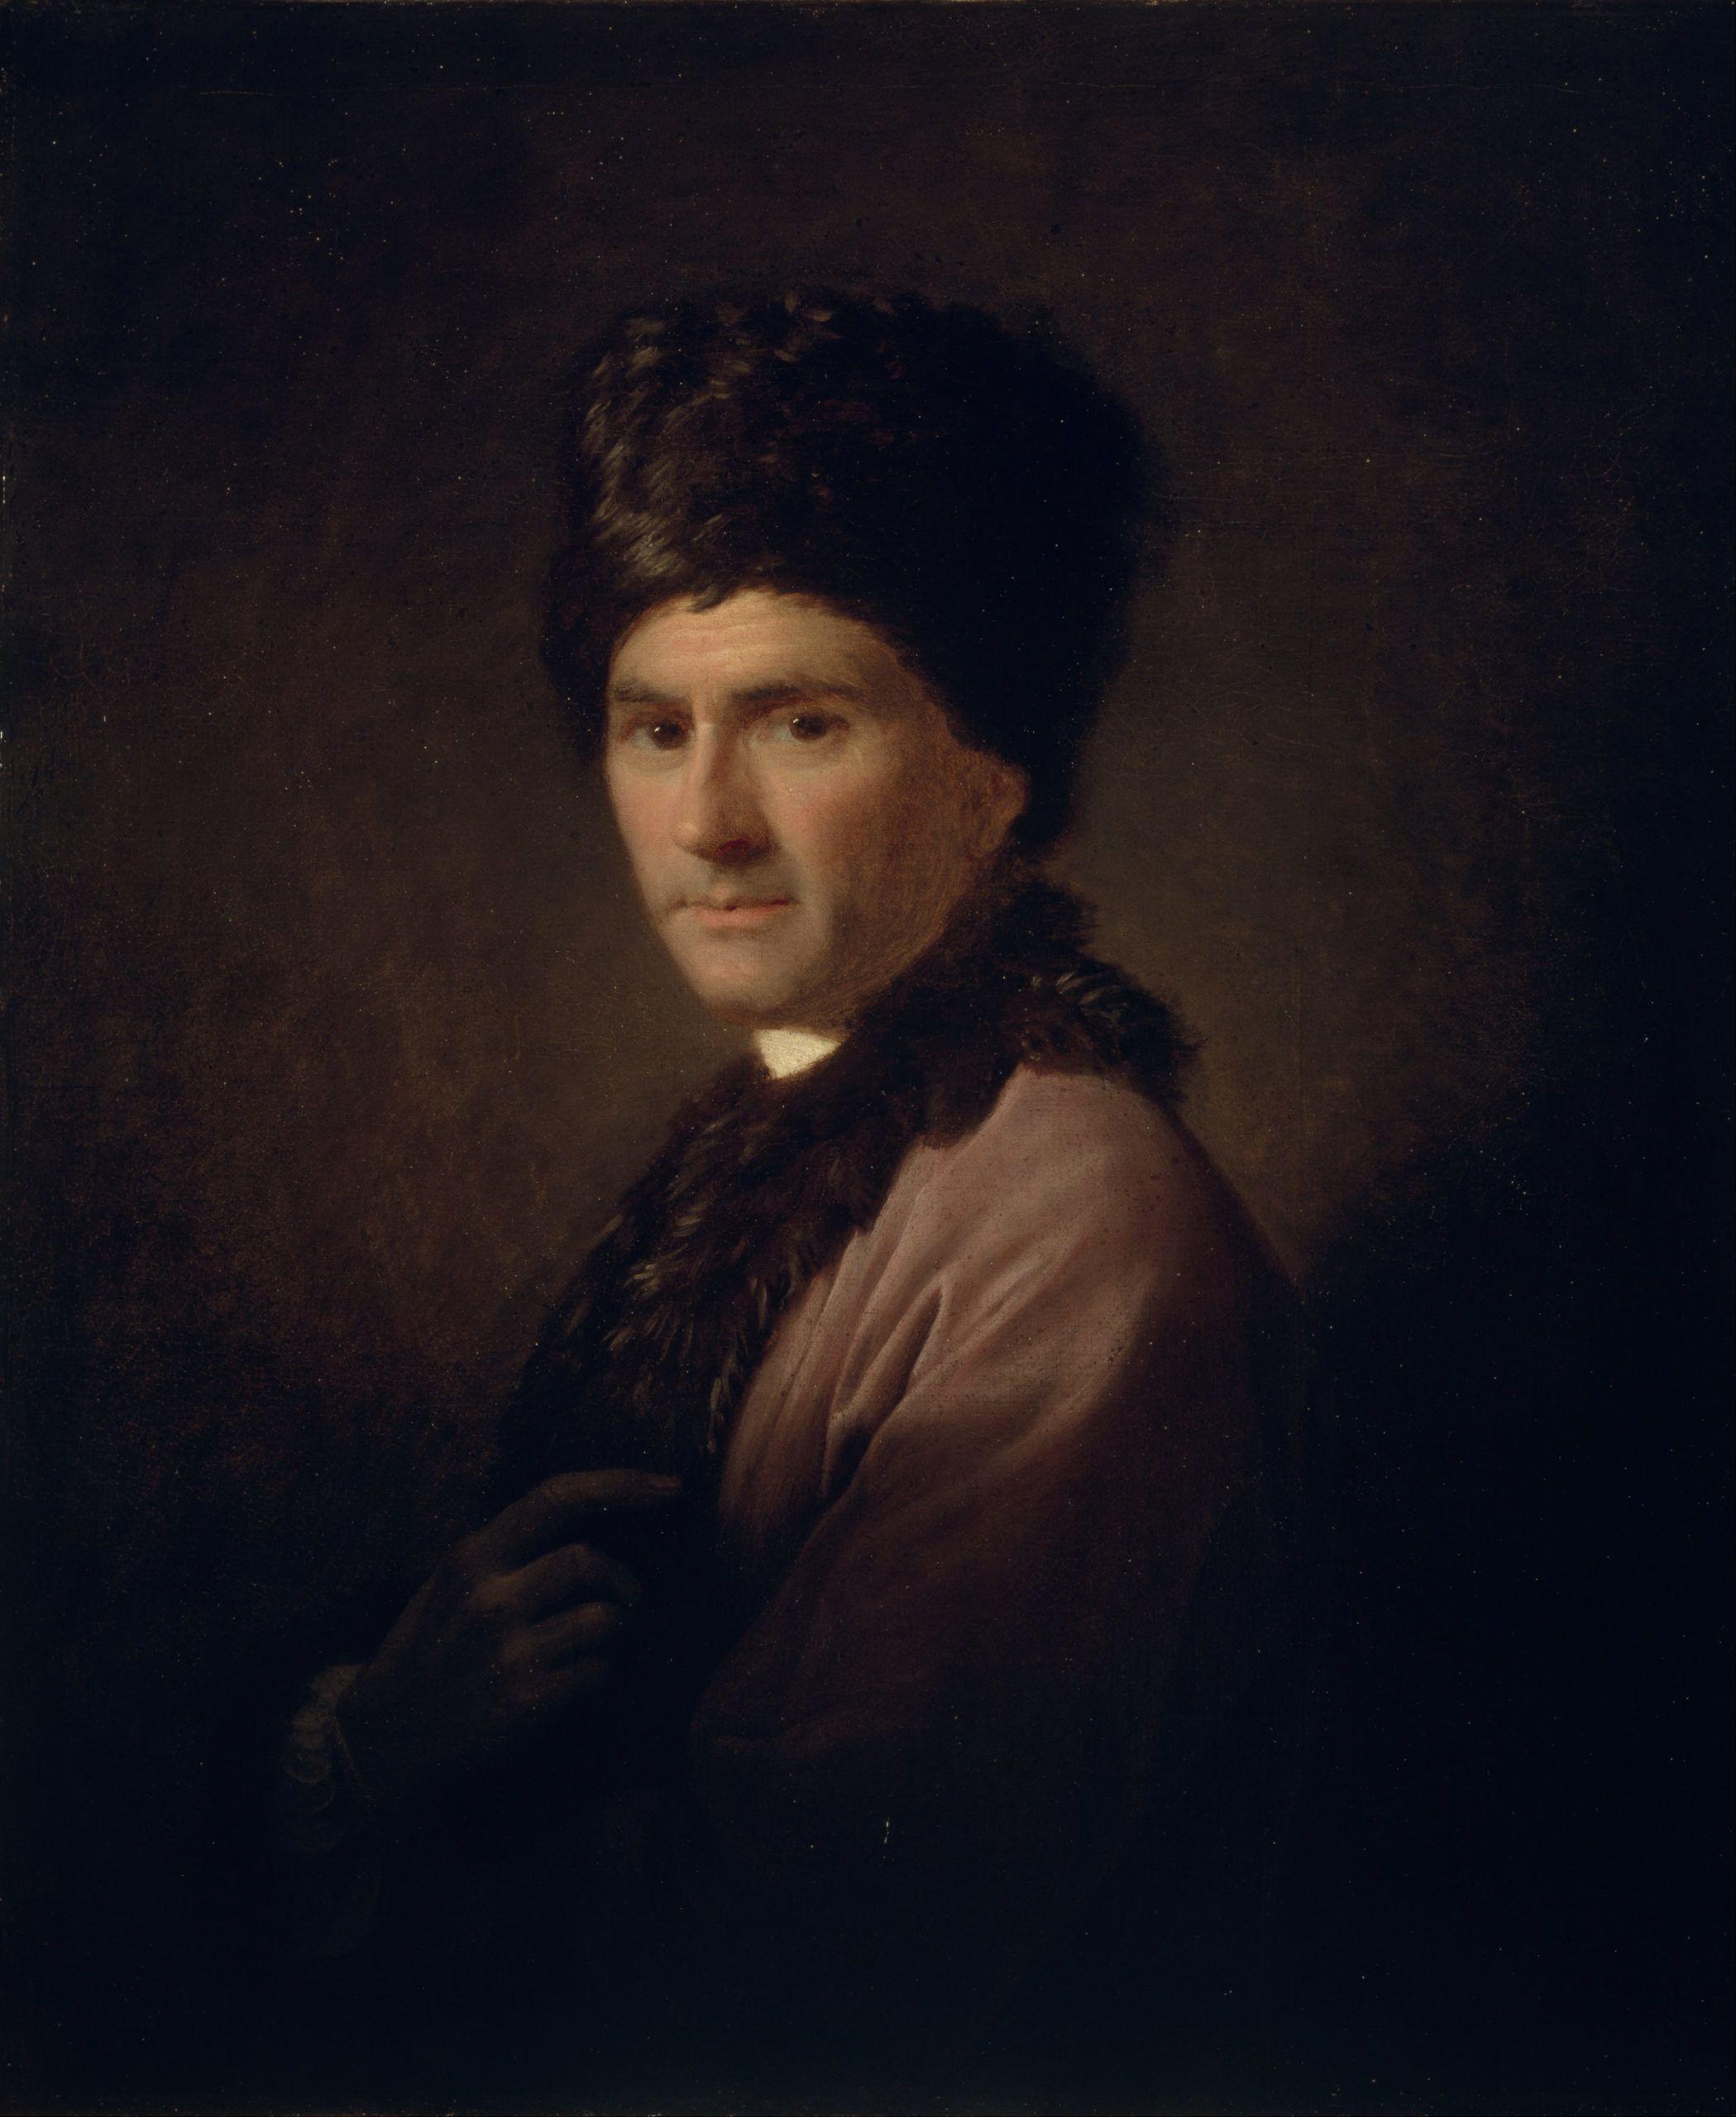 Jean-Jacques Rousseau 1766-ban (forrás: Wikipedia)